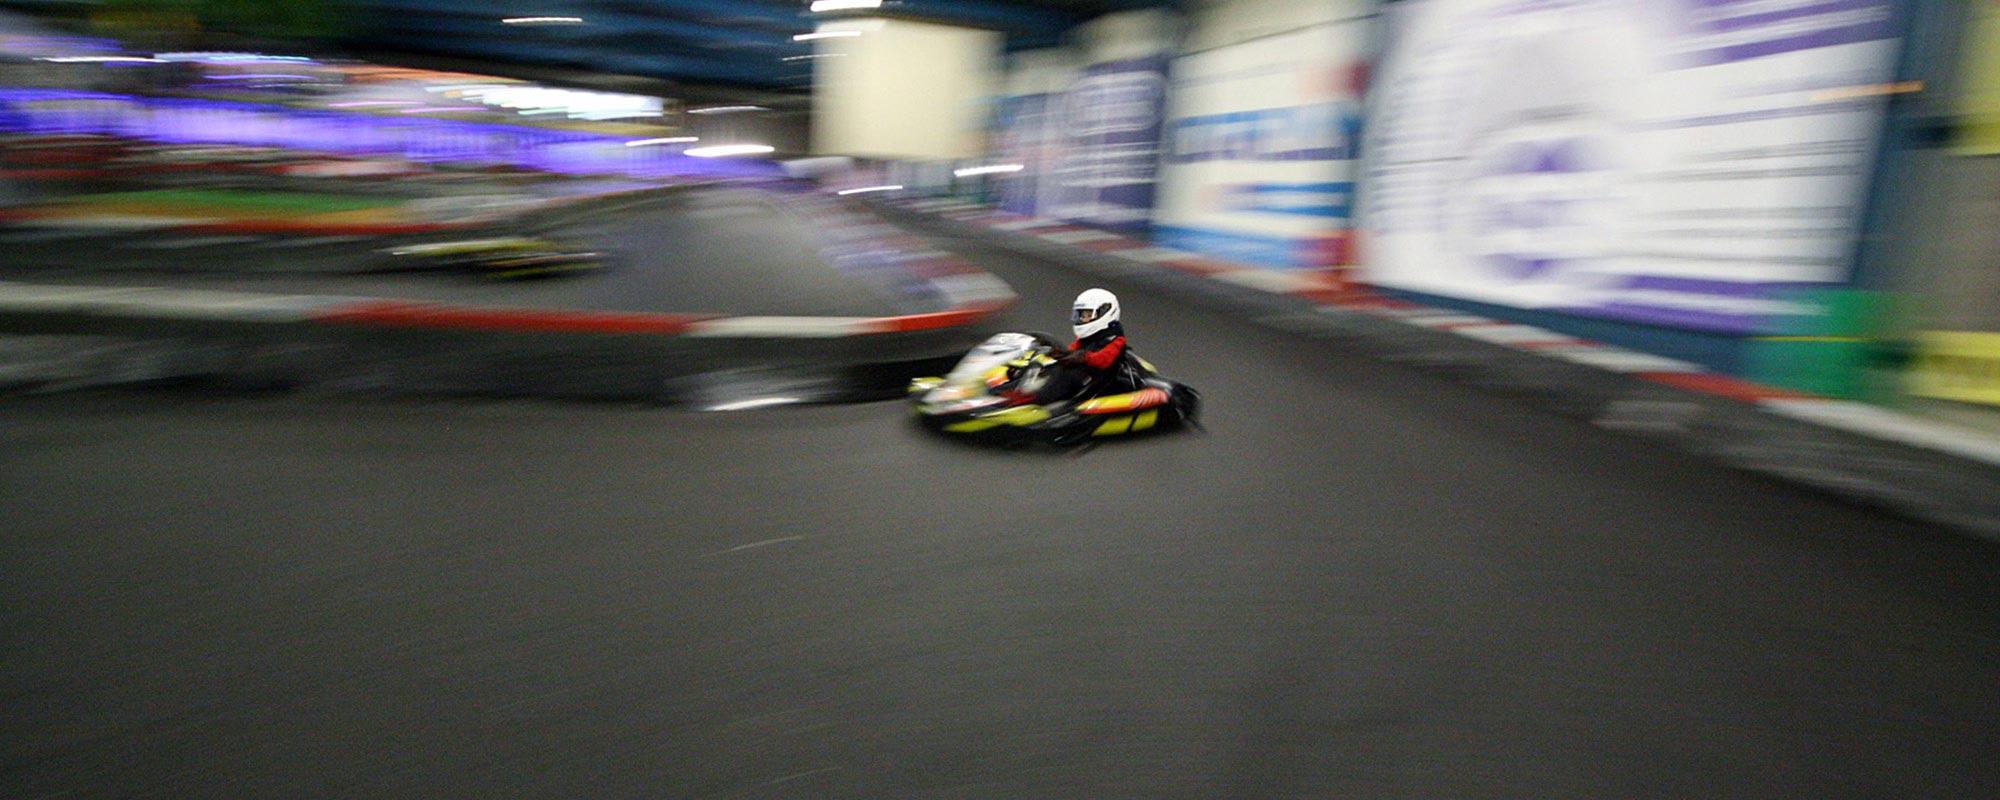 ebafkc-juniorkarting-2000x800-11